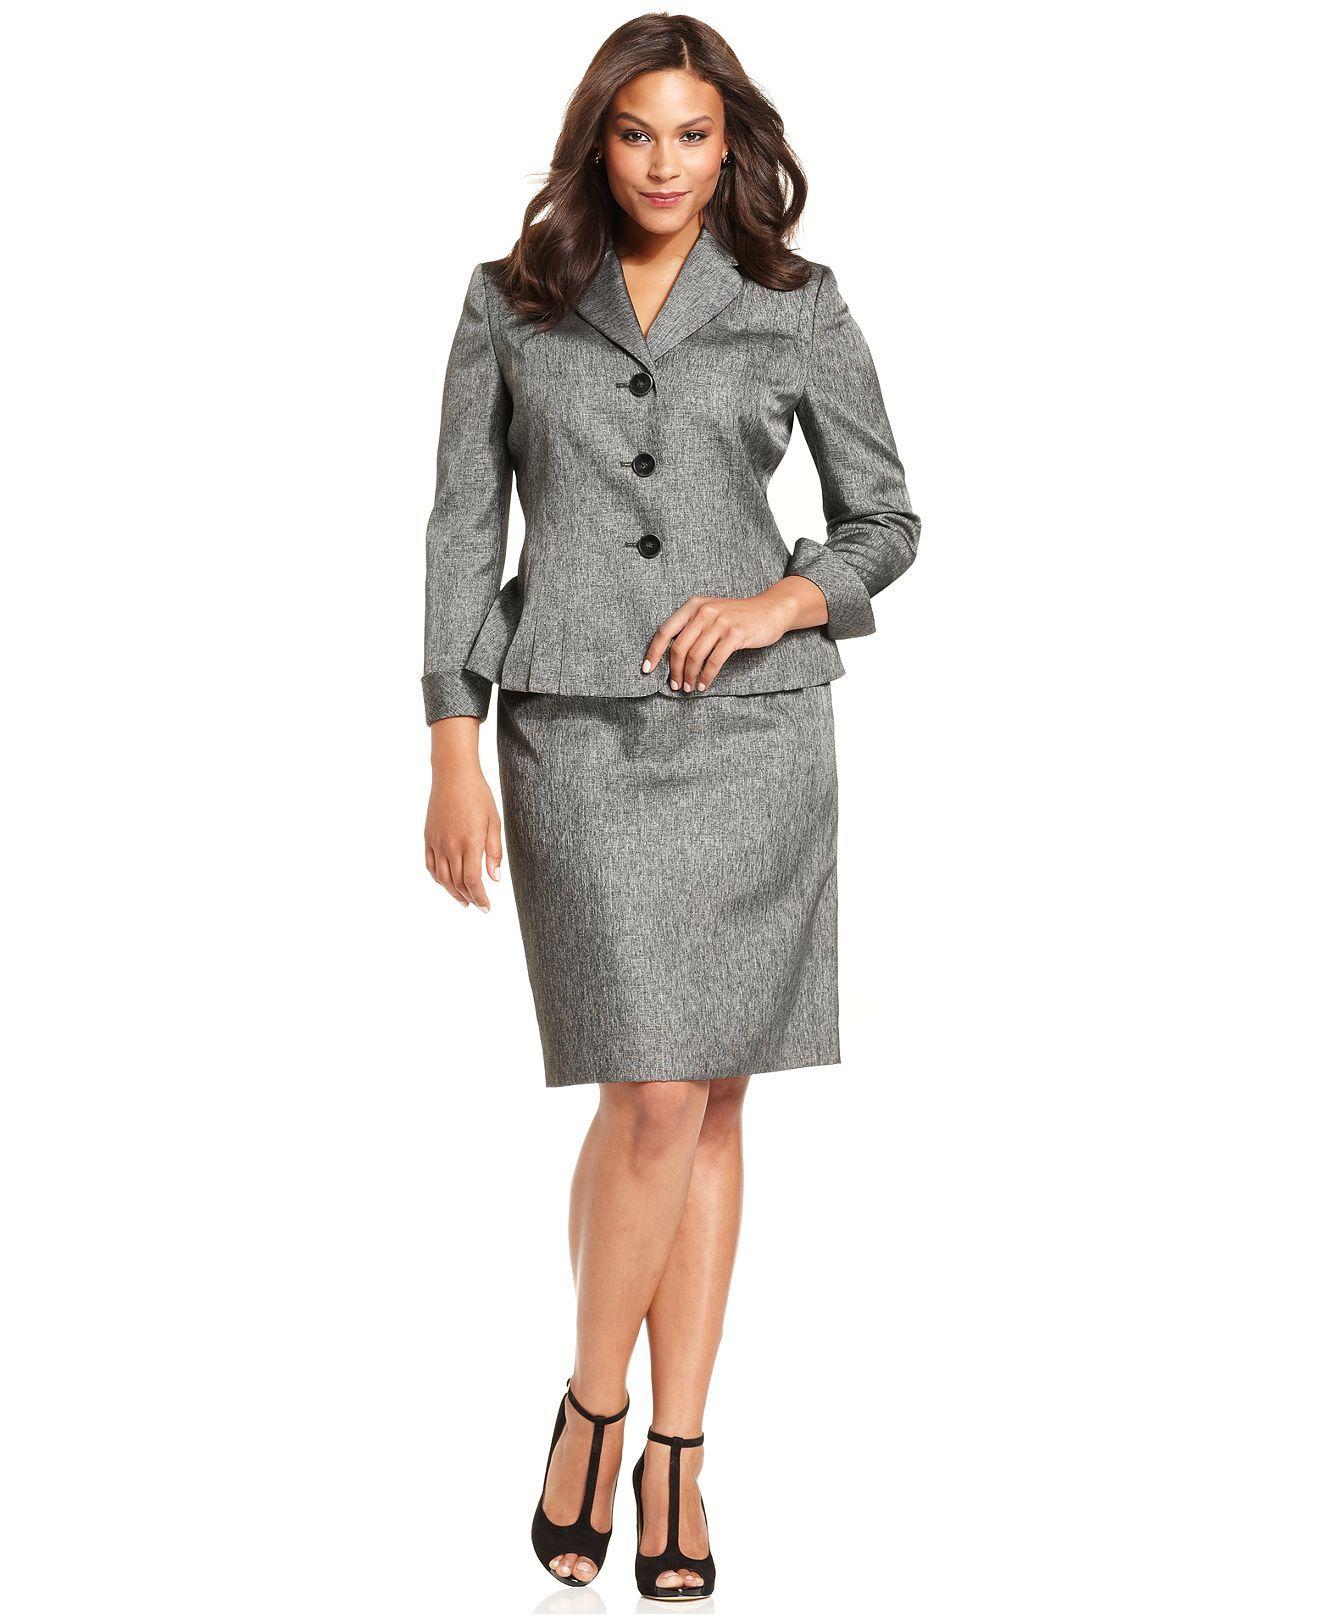 Plus Size Suit Pleated-Hem Blazer & Skirt Gray Women Suit Custom ...